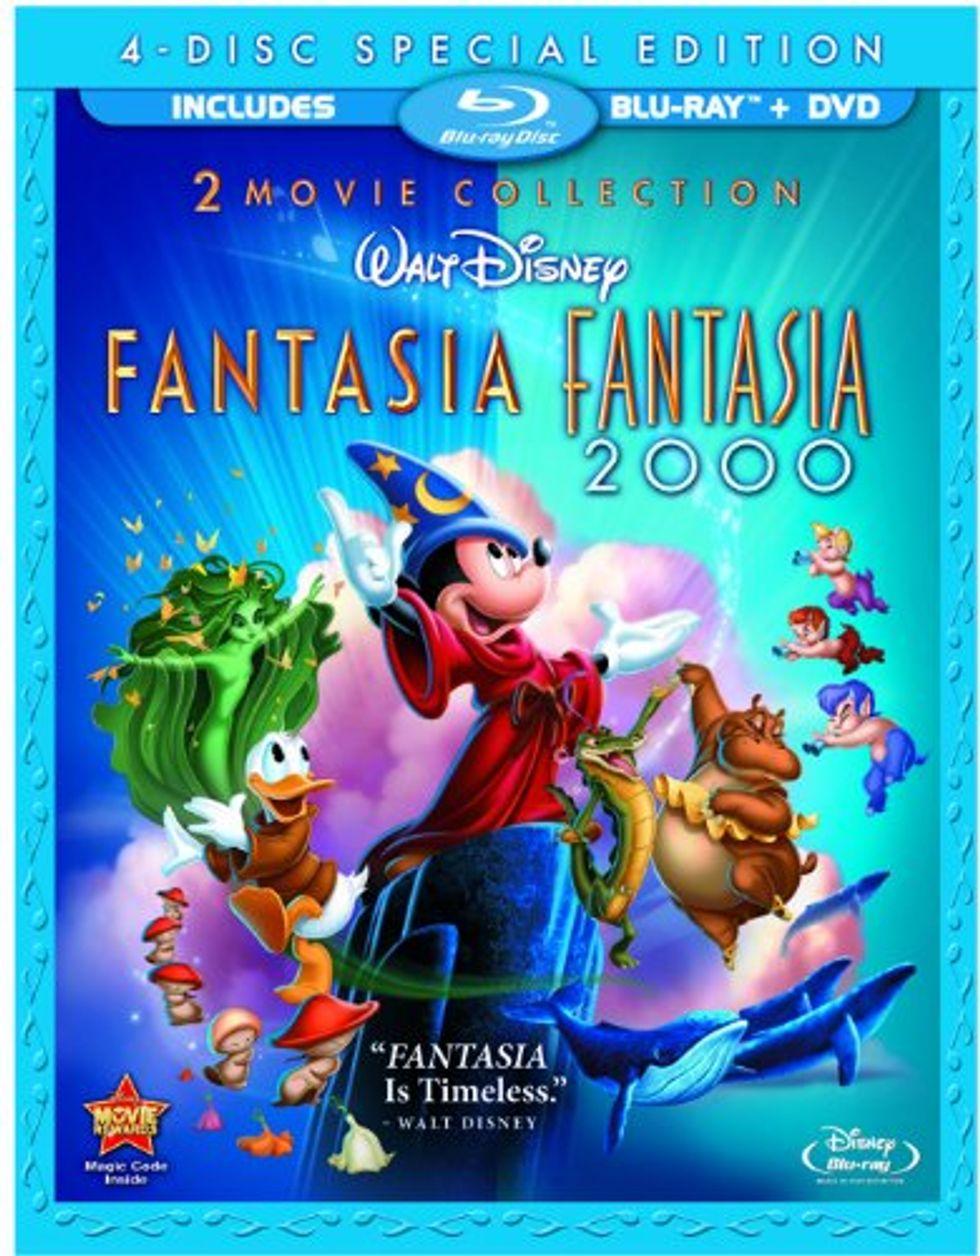 Fantasia On Disney Blu-ray and DVD